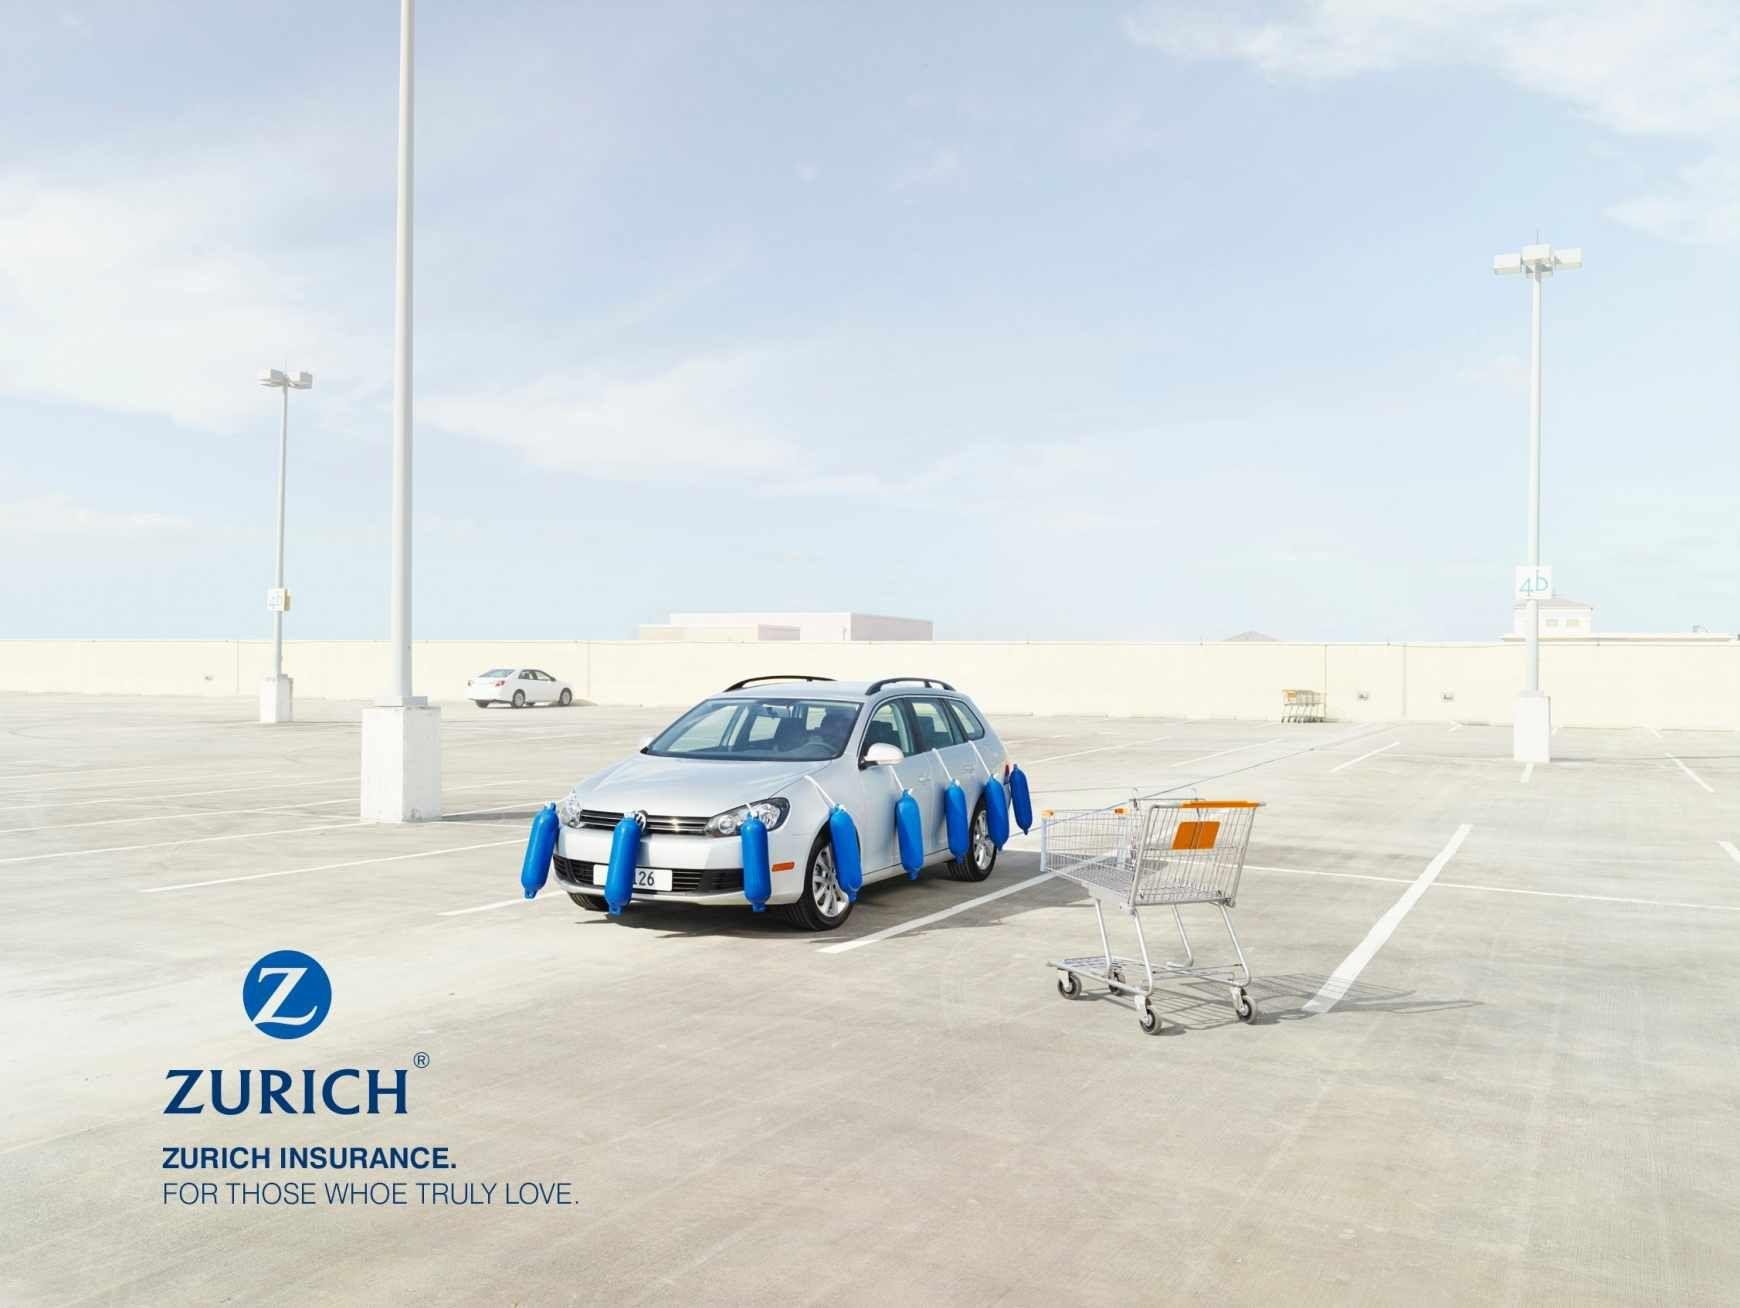 Zurich Insurance Company Car Protection Trolley Werbung